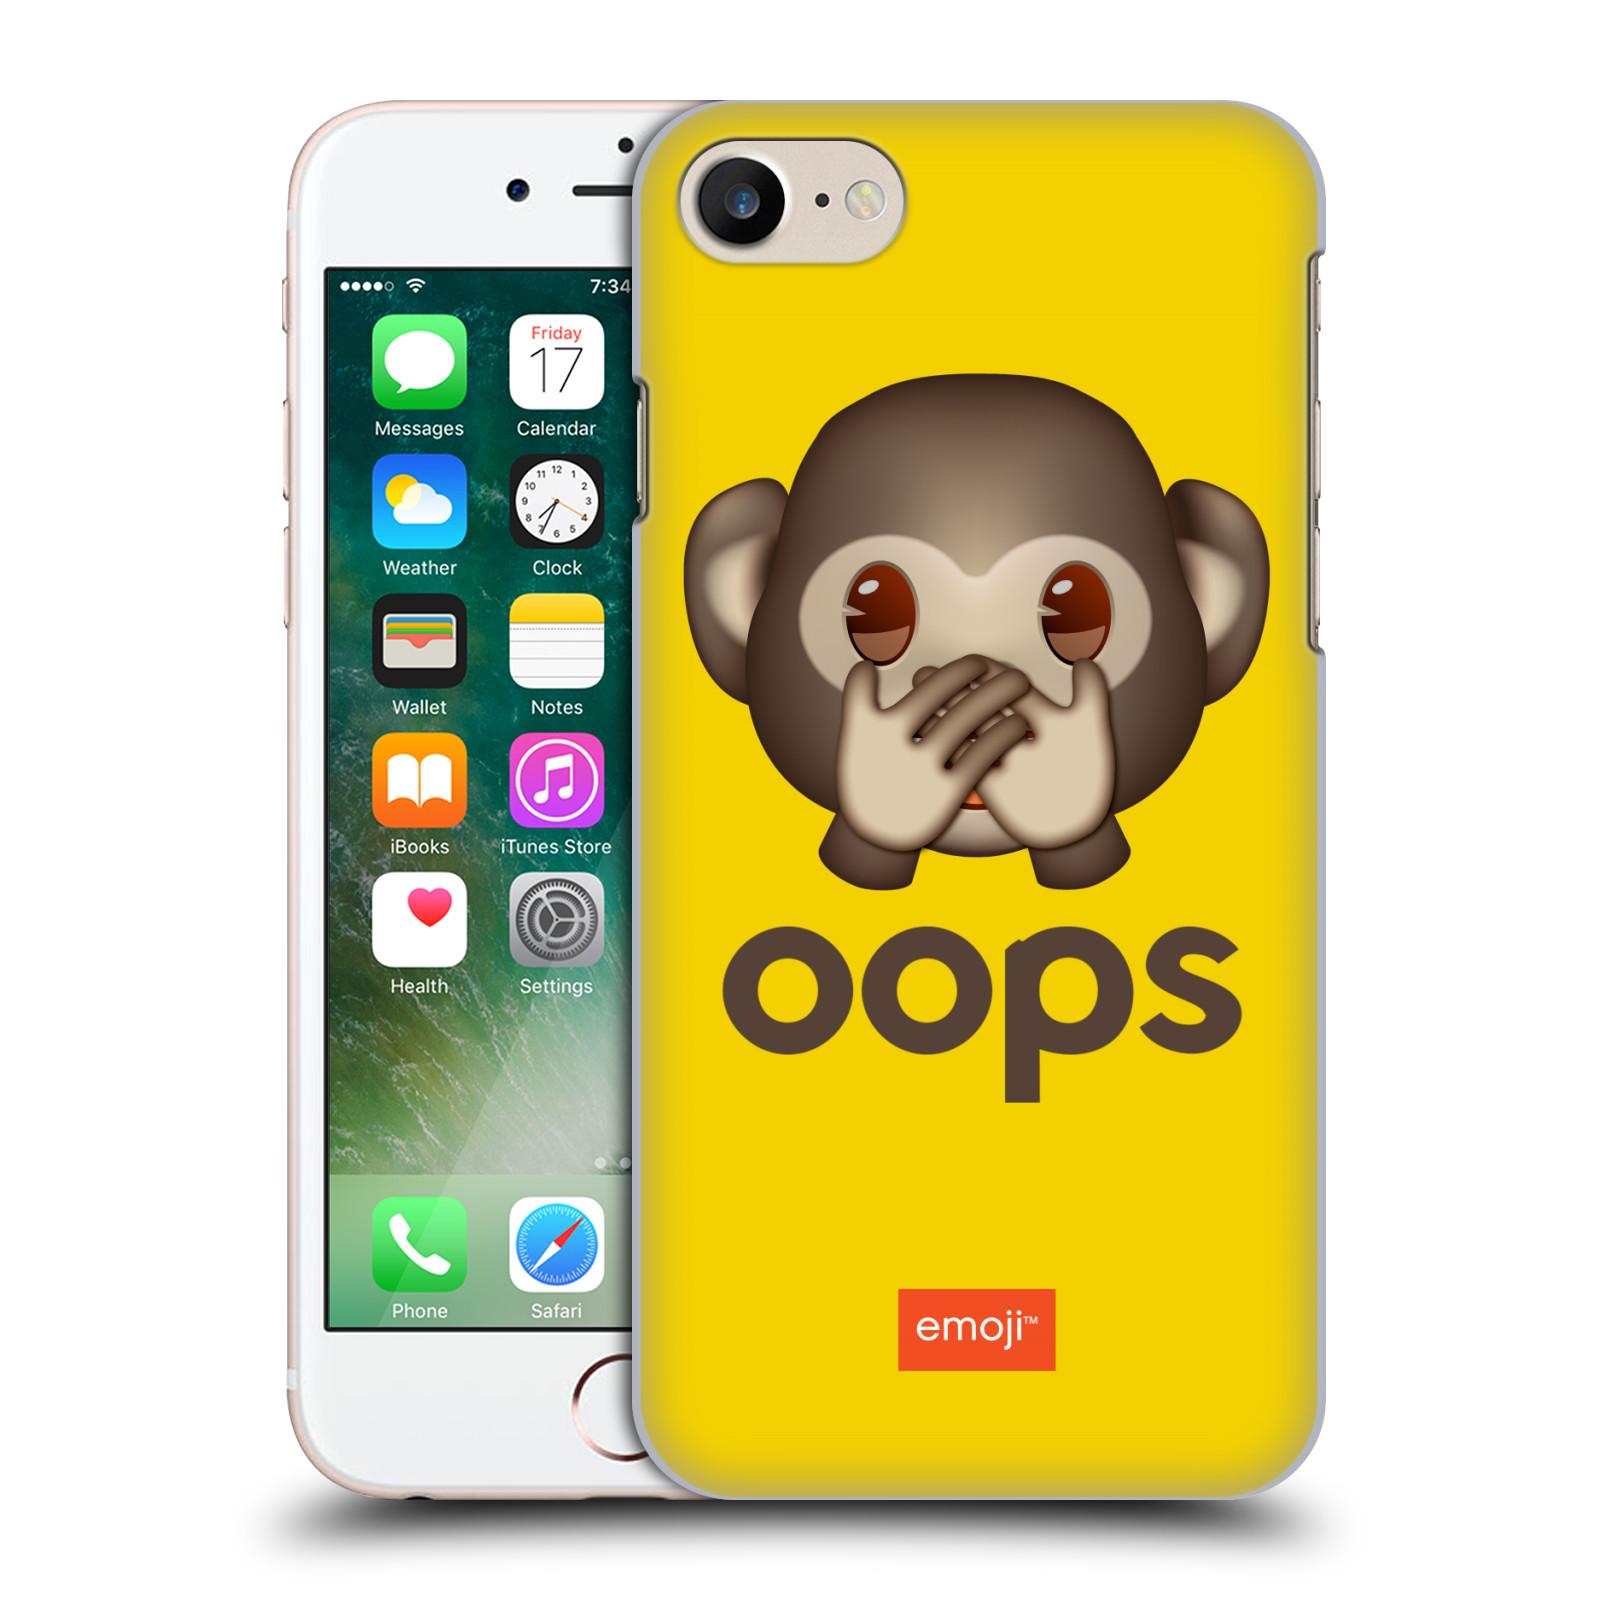 Plastové pouzdro na mobil Apple iPhone 7 HEAD CASE EMOJI - Opička OOPS